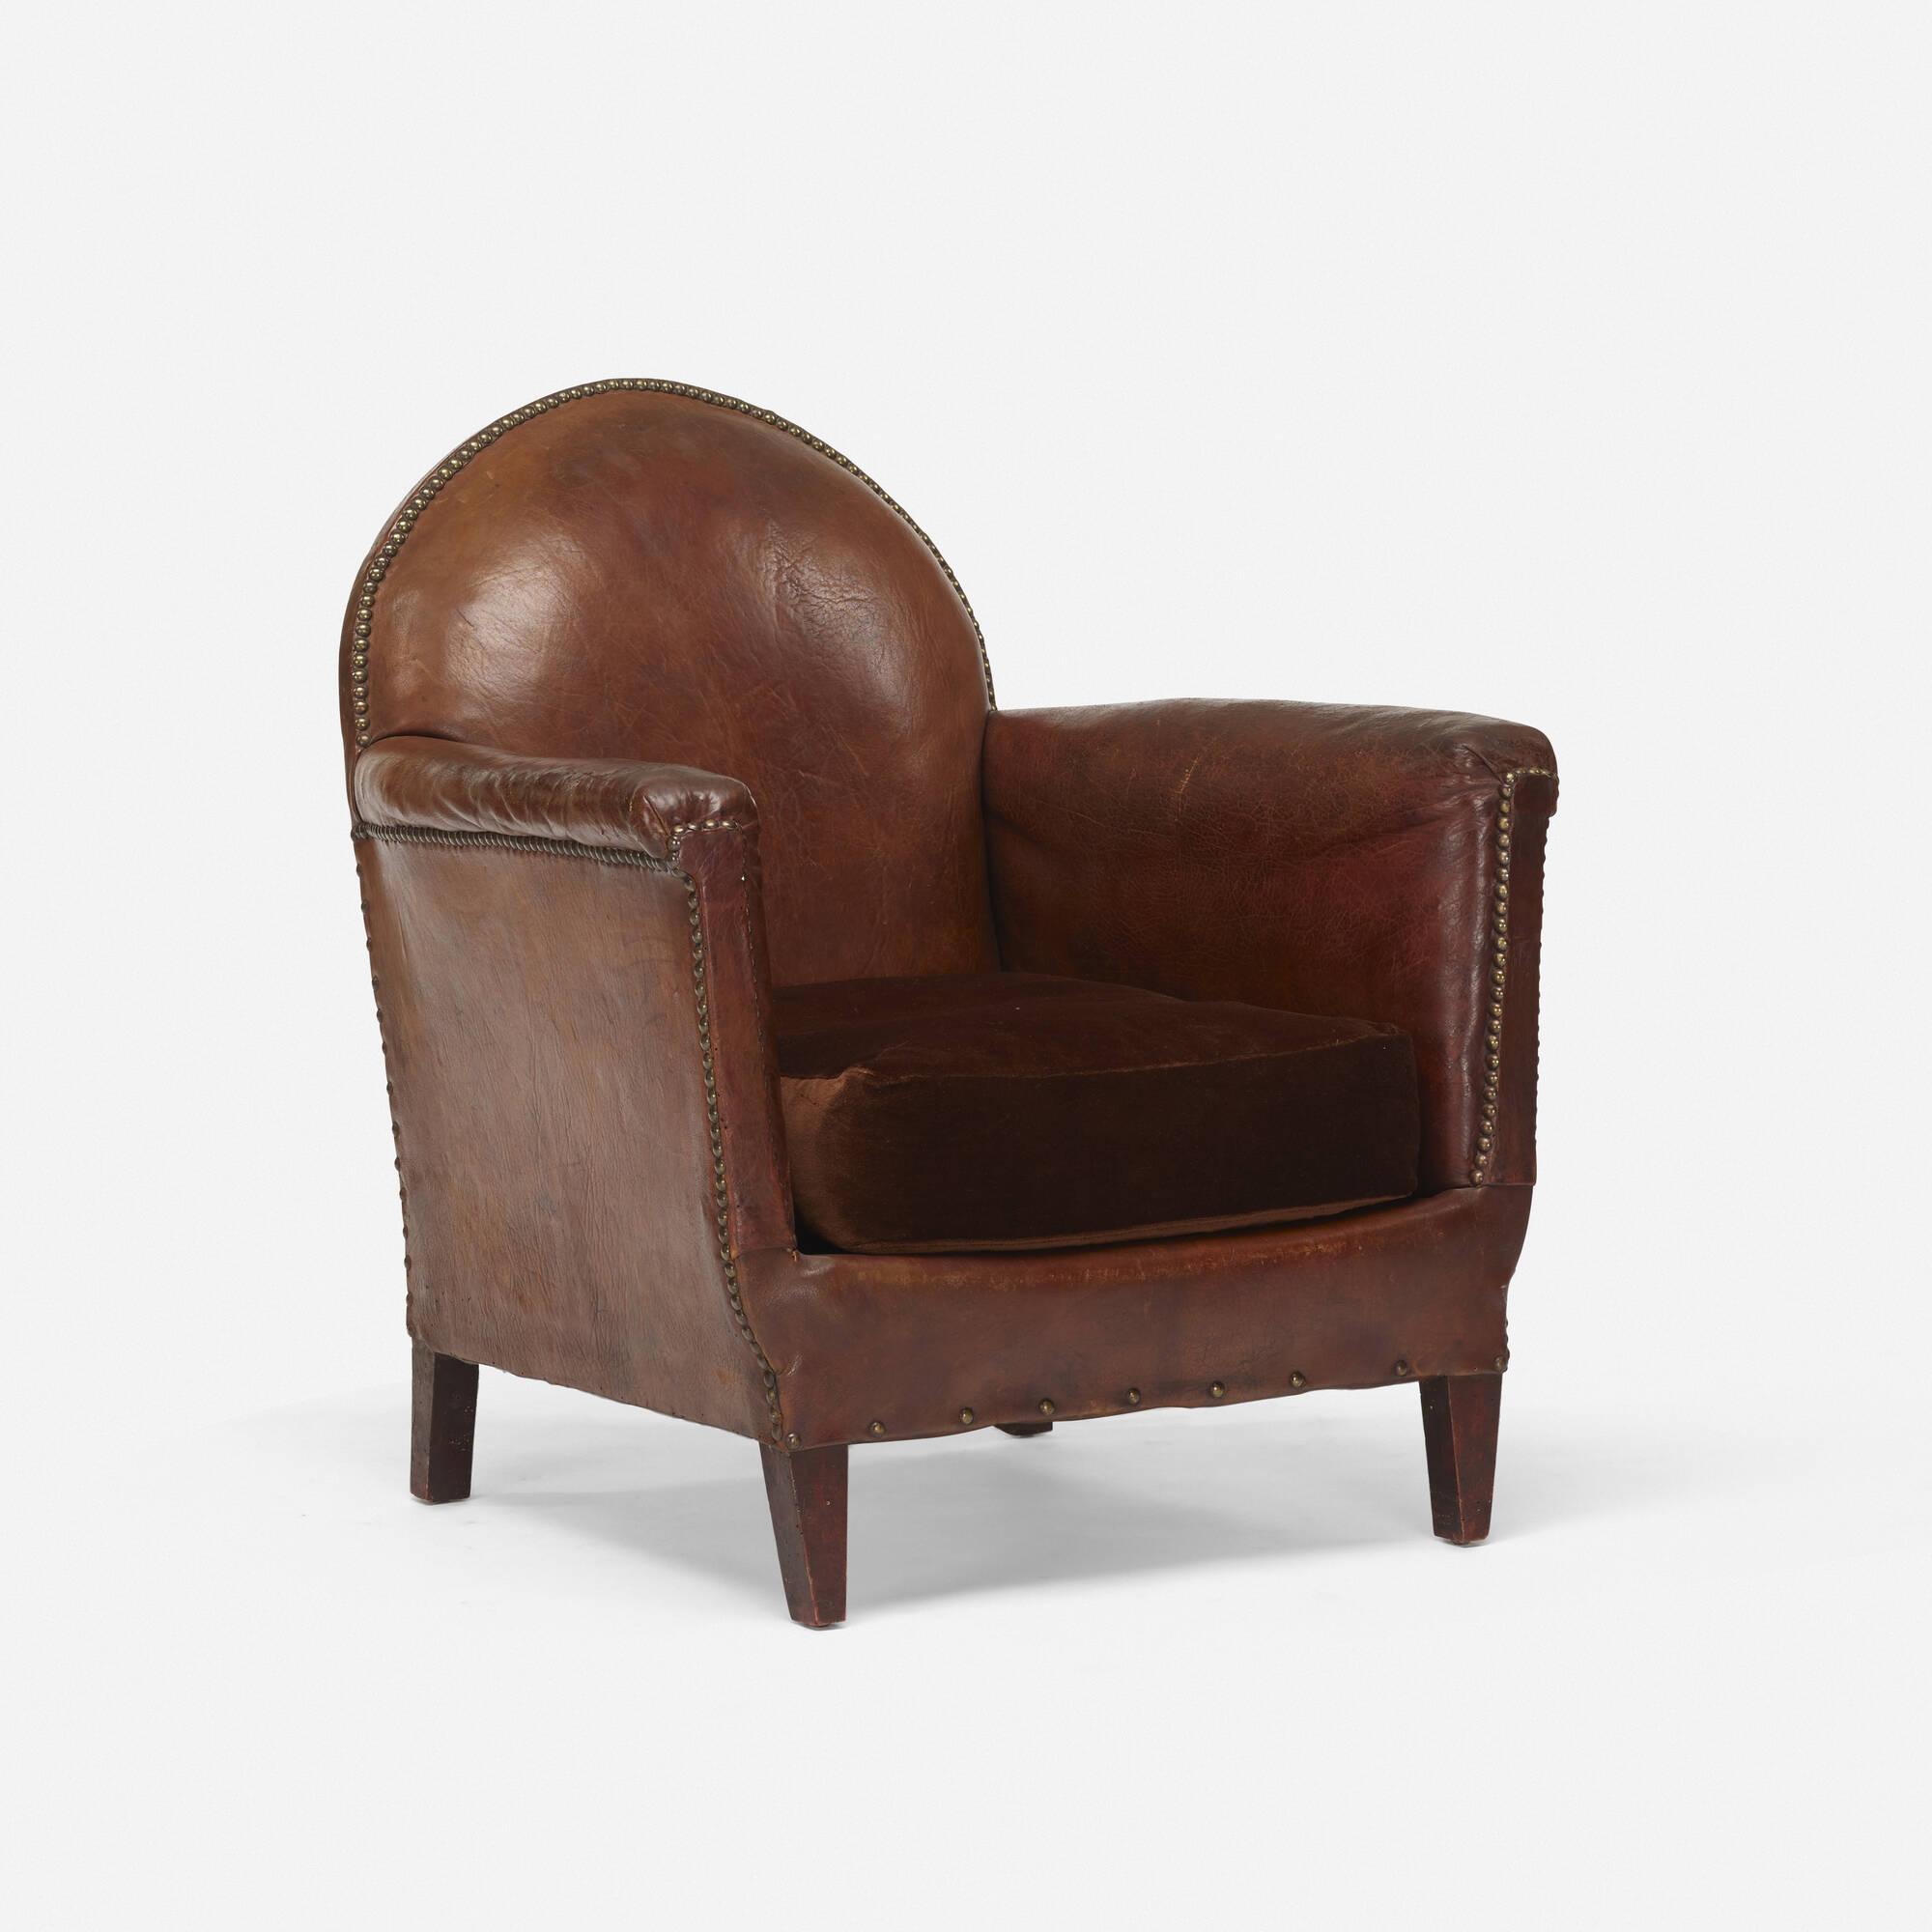 161 FRENCH club chair